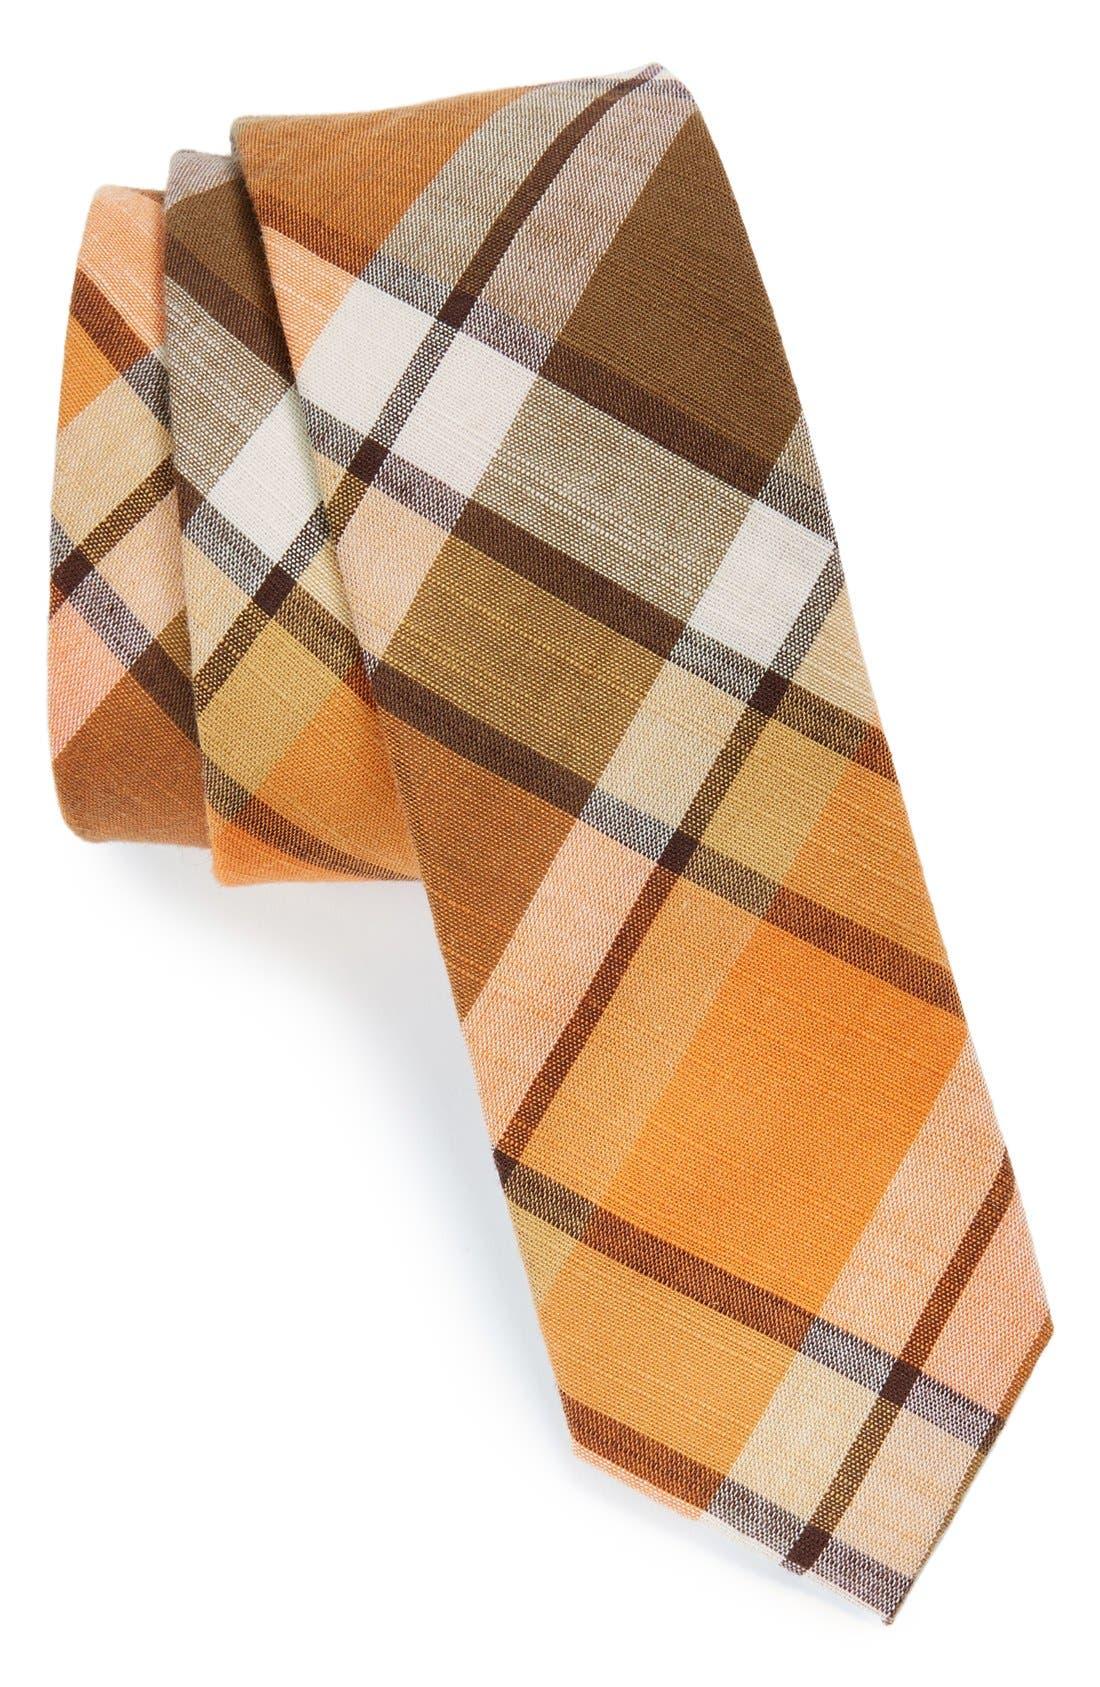 Alternate Image 1 Selected - Original Penguin Woven Cotton Tie